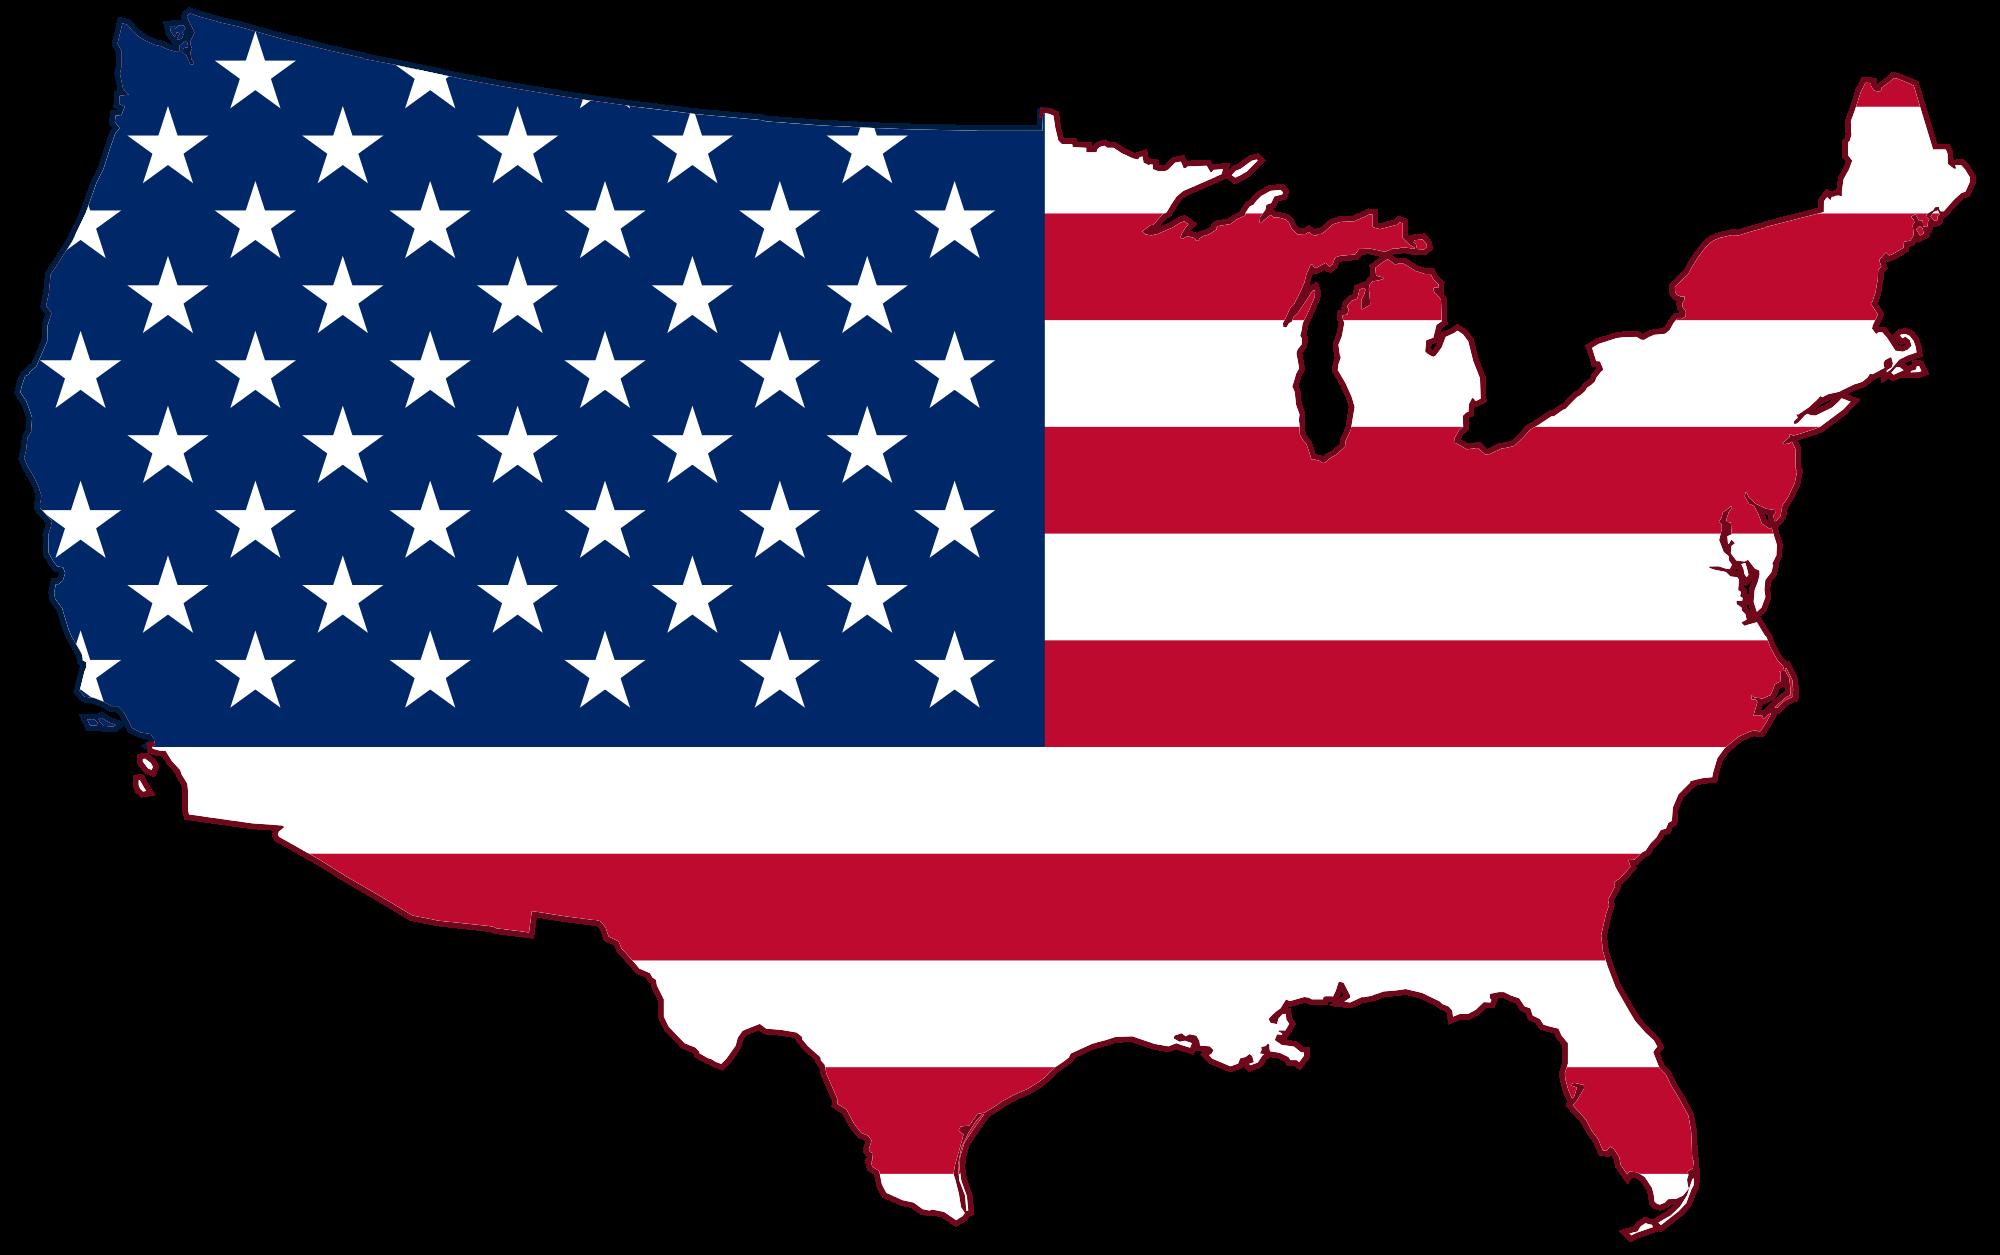 Pinata clipart flag. The united states of